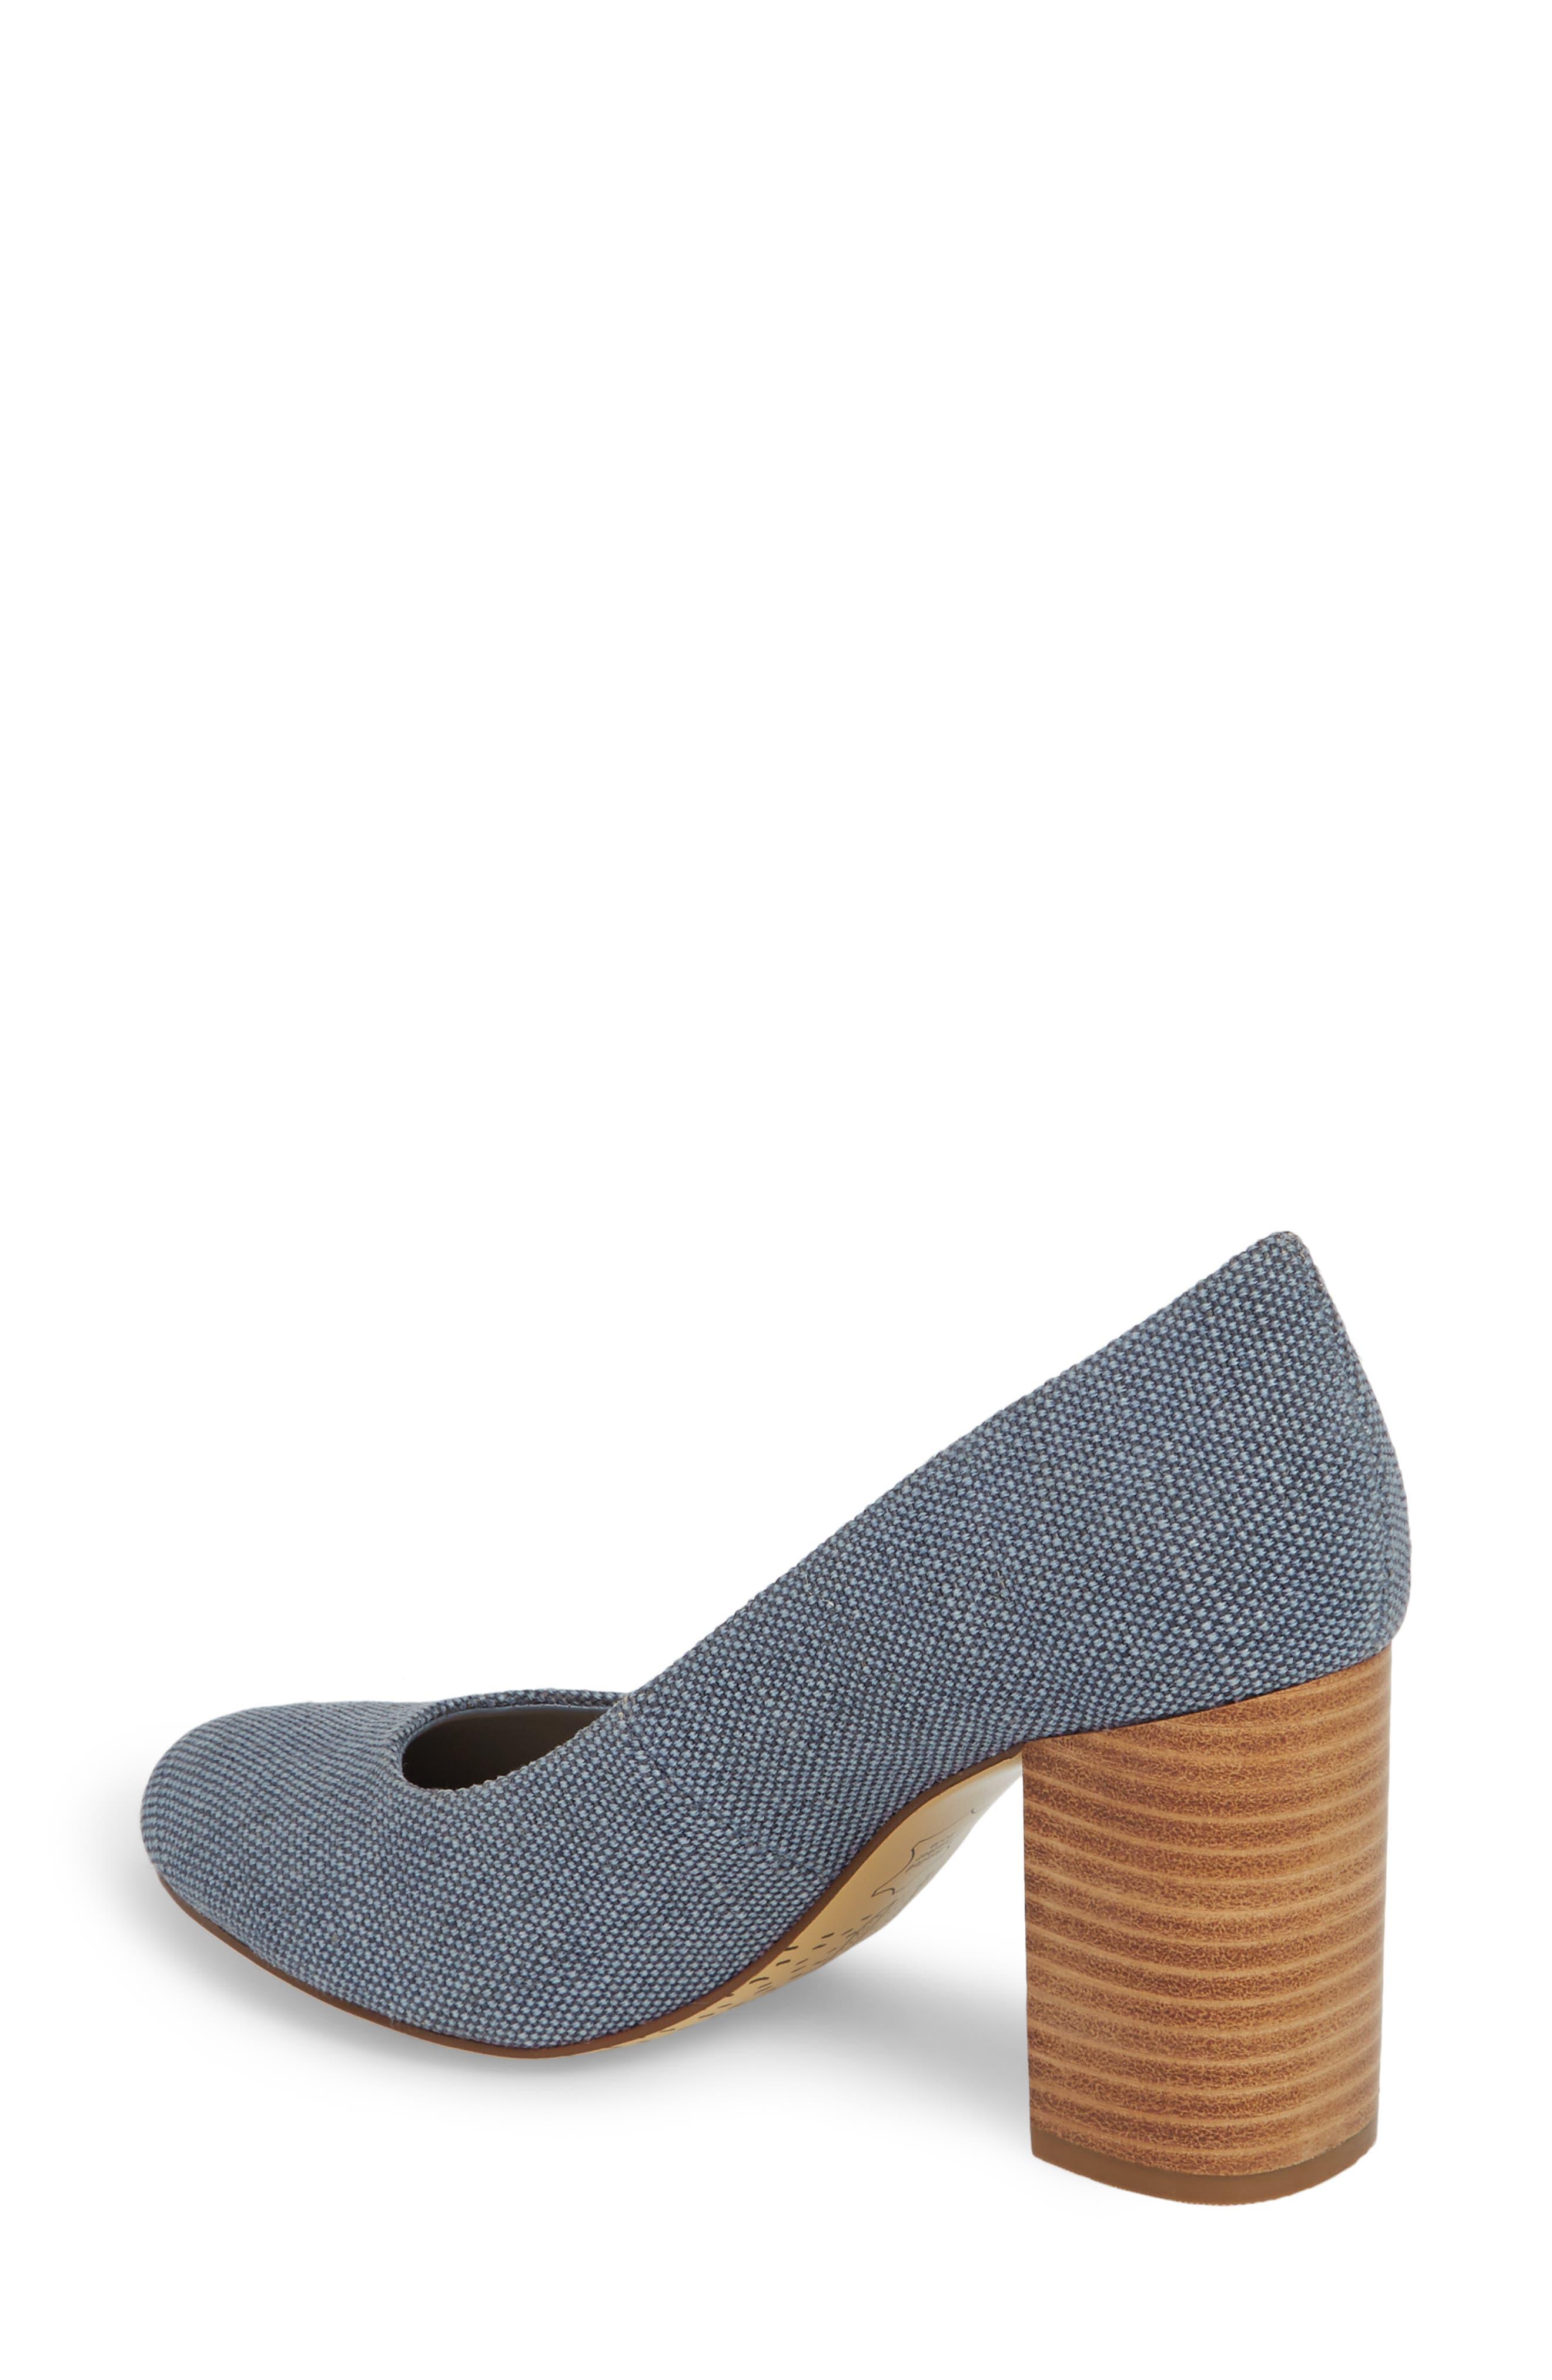 Alternate Image 2  - Bella Vita 'Nara' Block Heel Pump (Women)